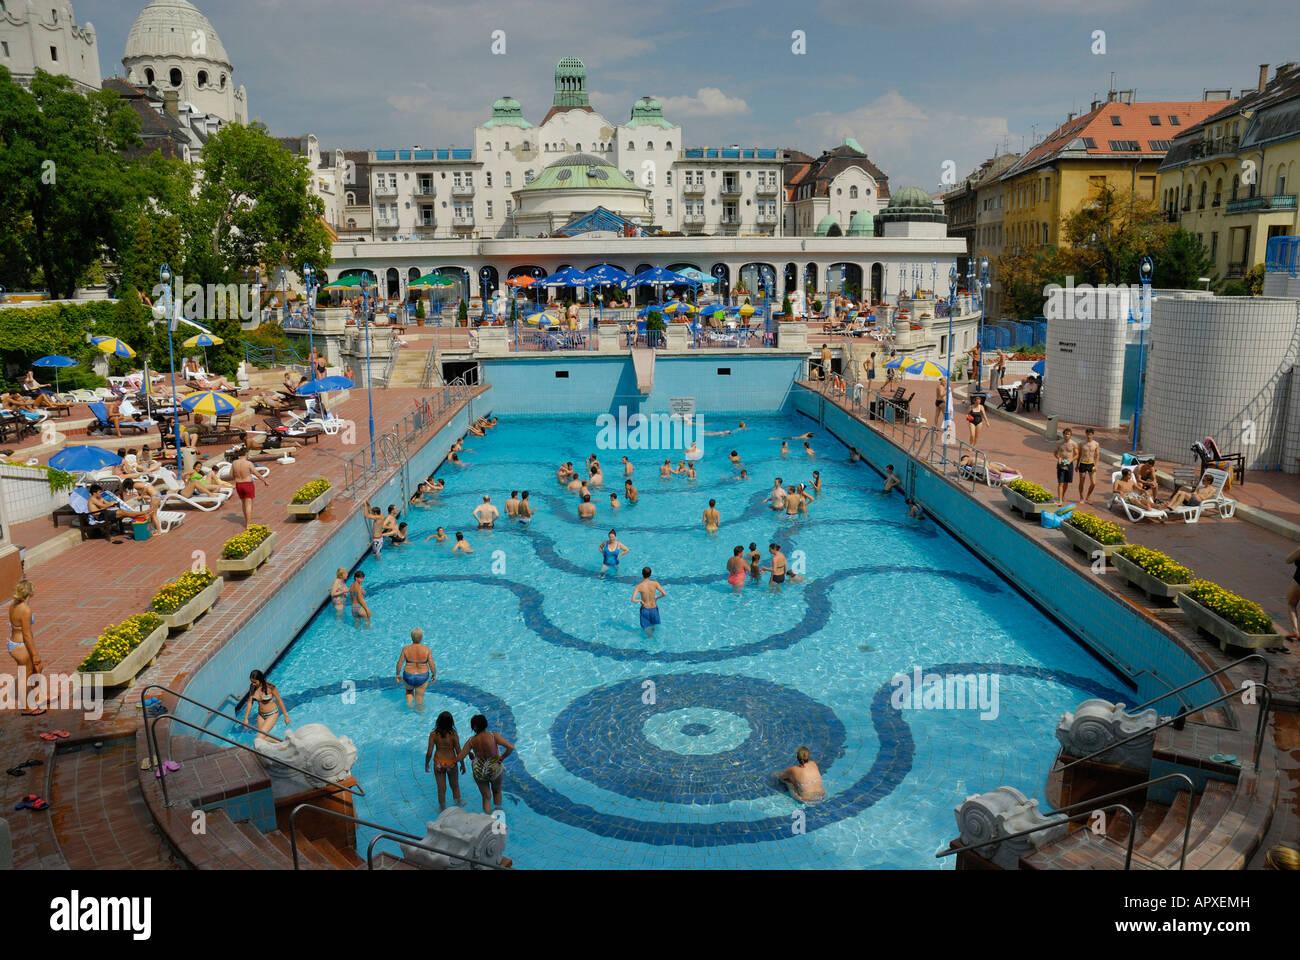 Bagni Termali Gellert : Gellert bagni termali. budapest ungheria foto & immagine stock